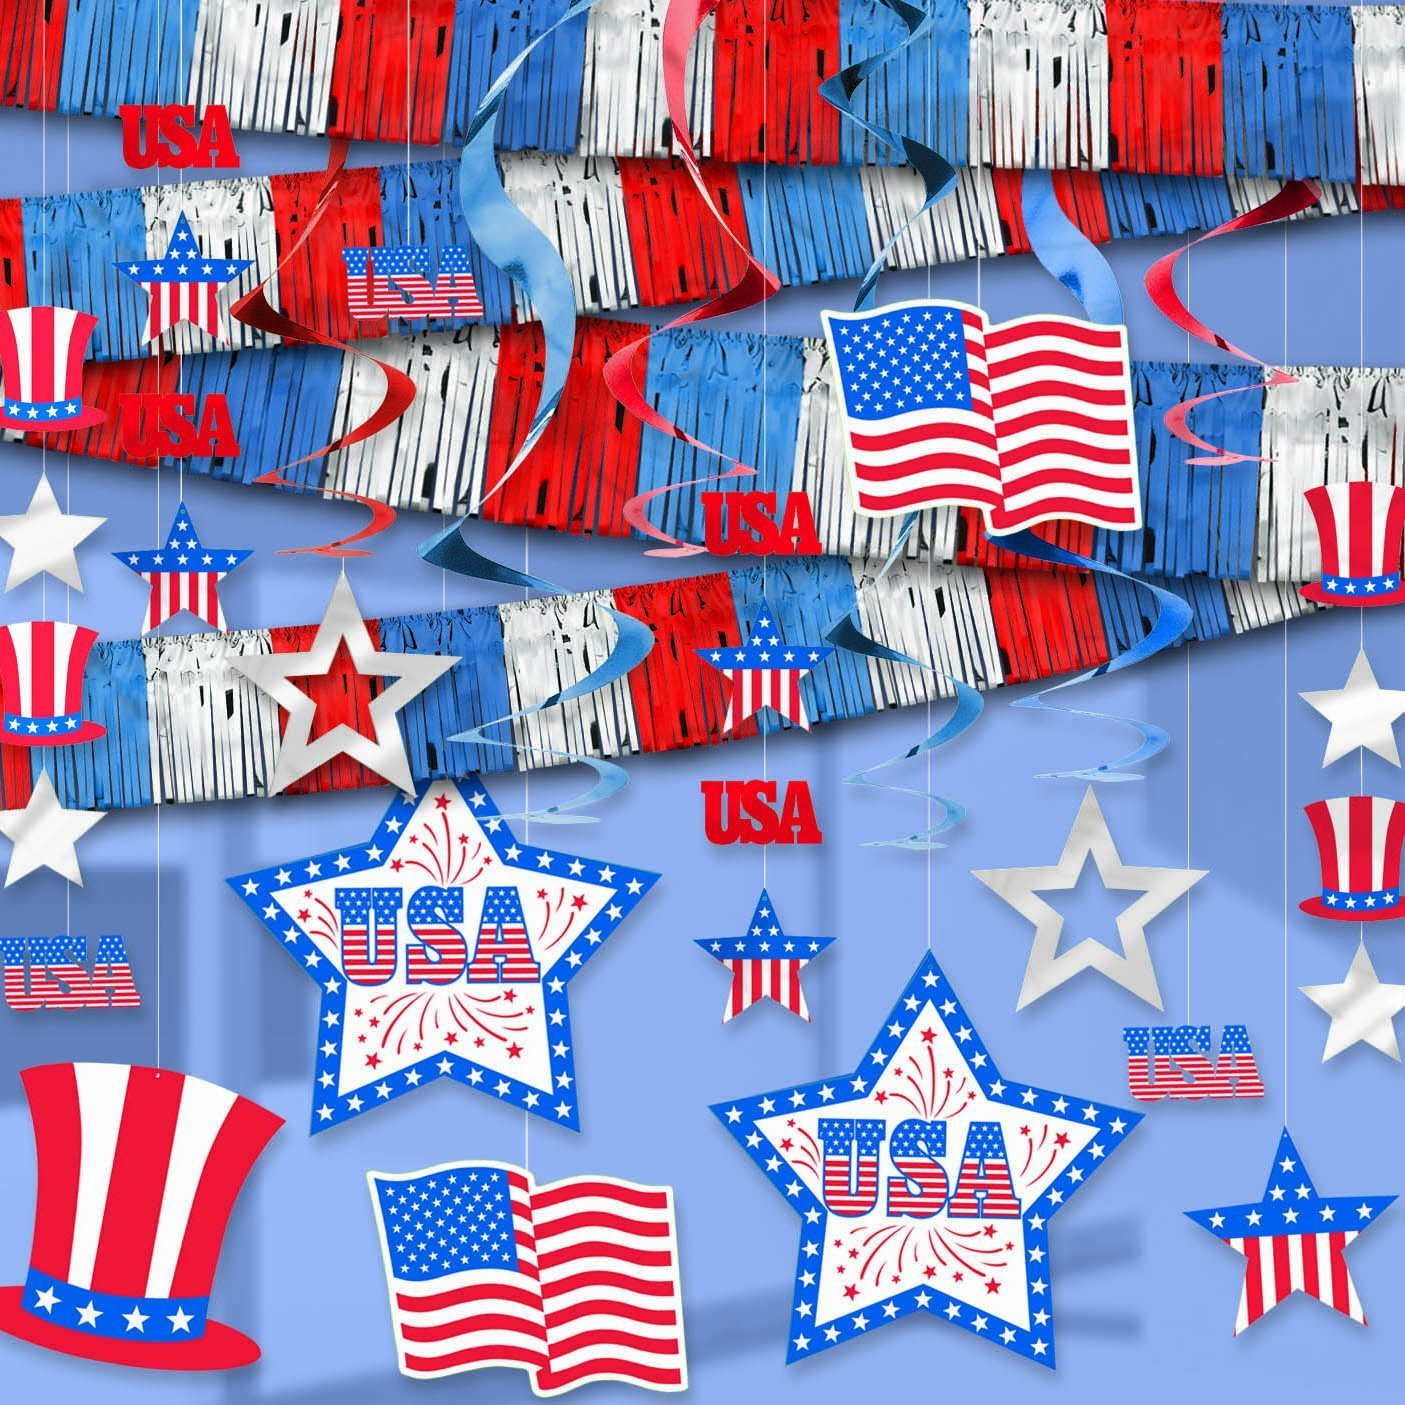 Patriotic Room Decorating Kit